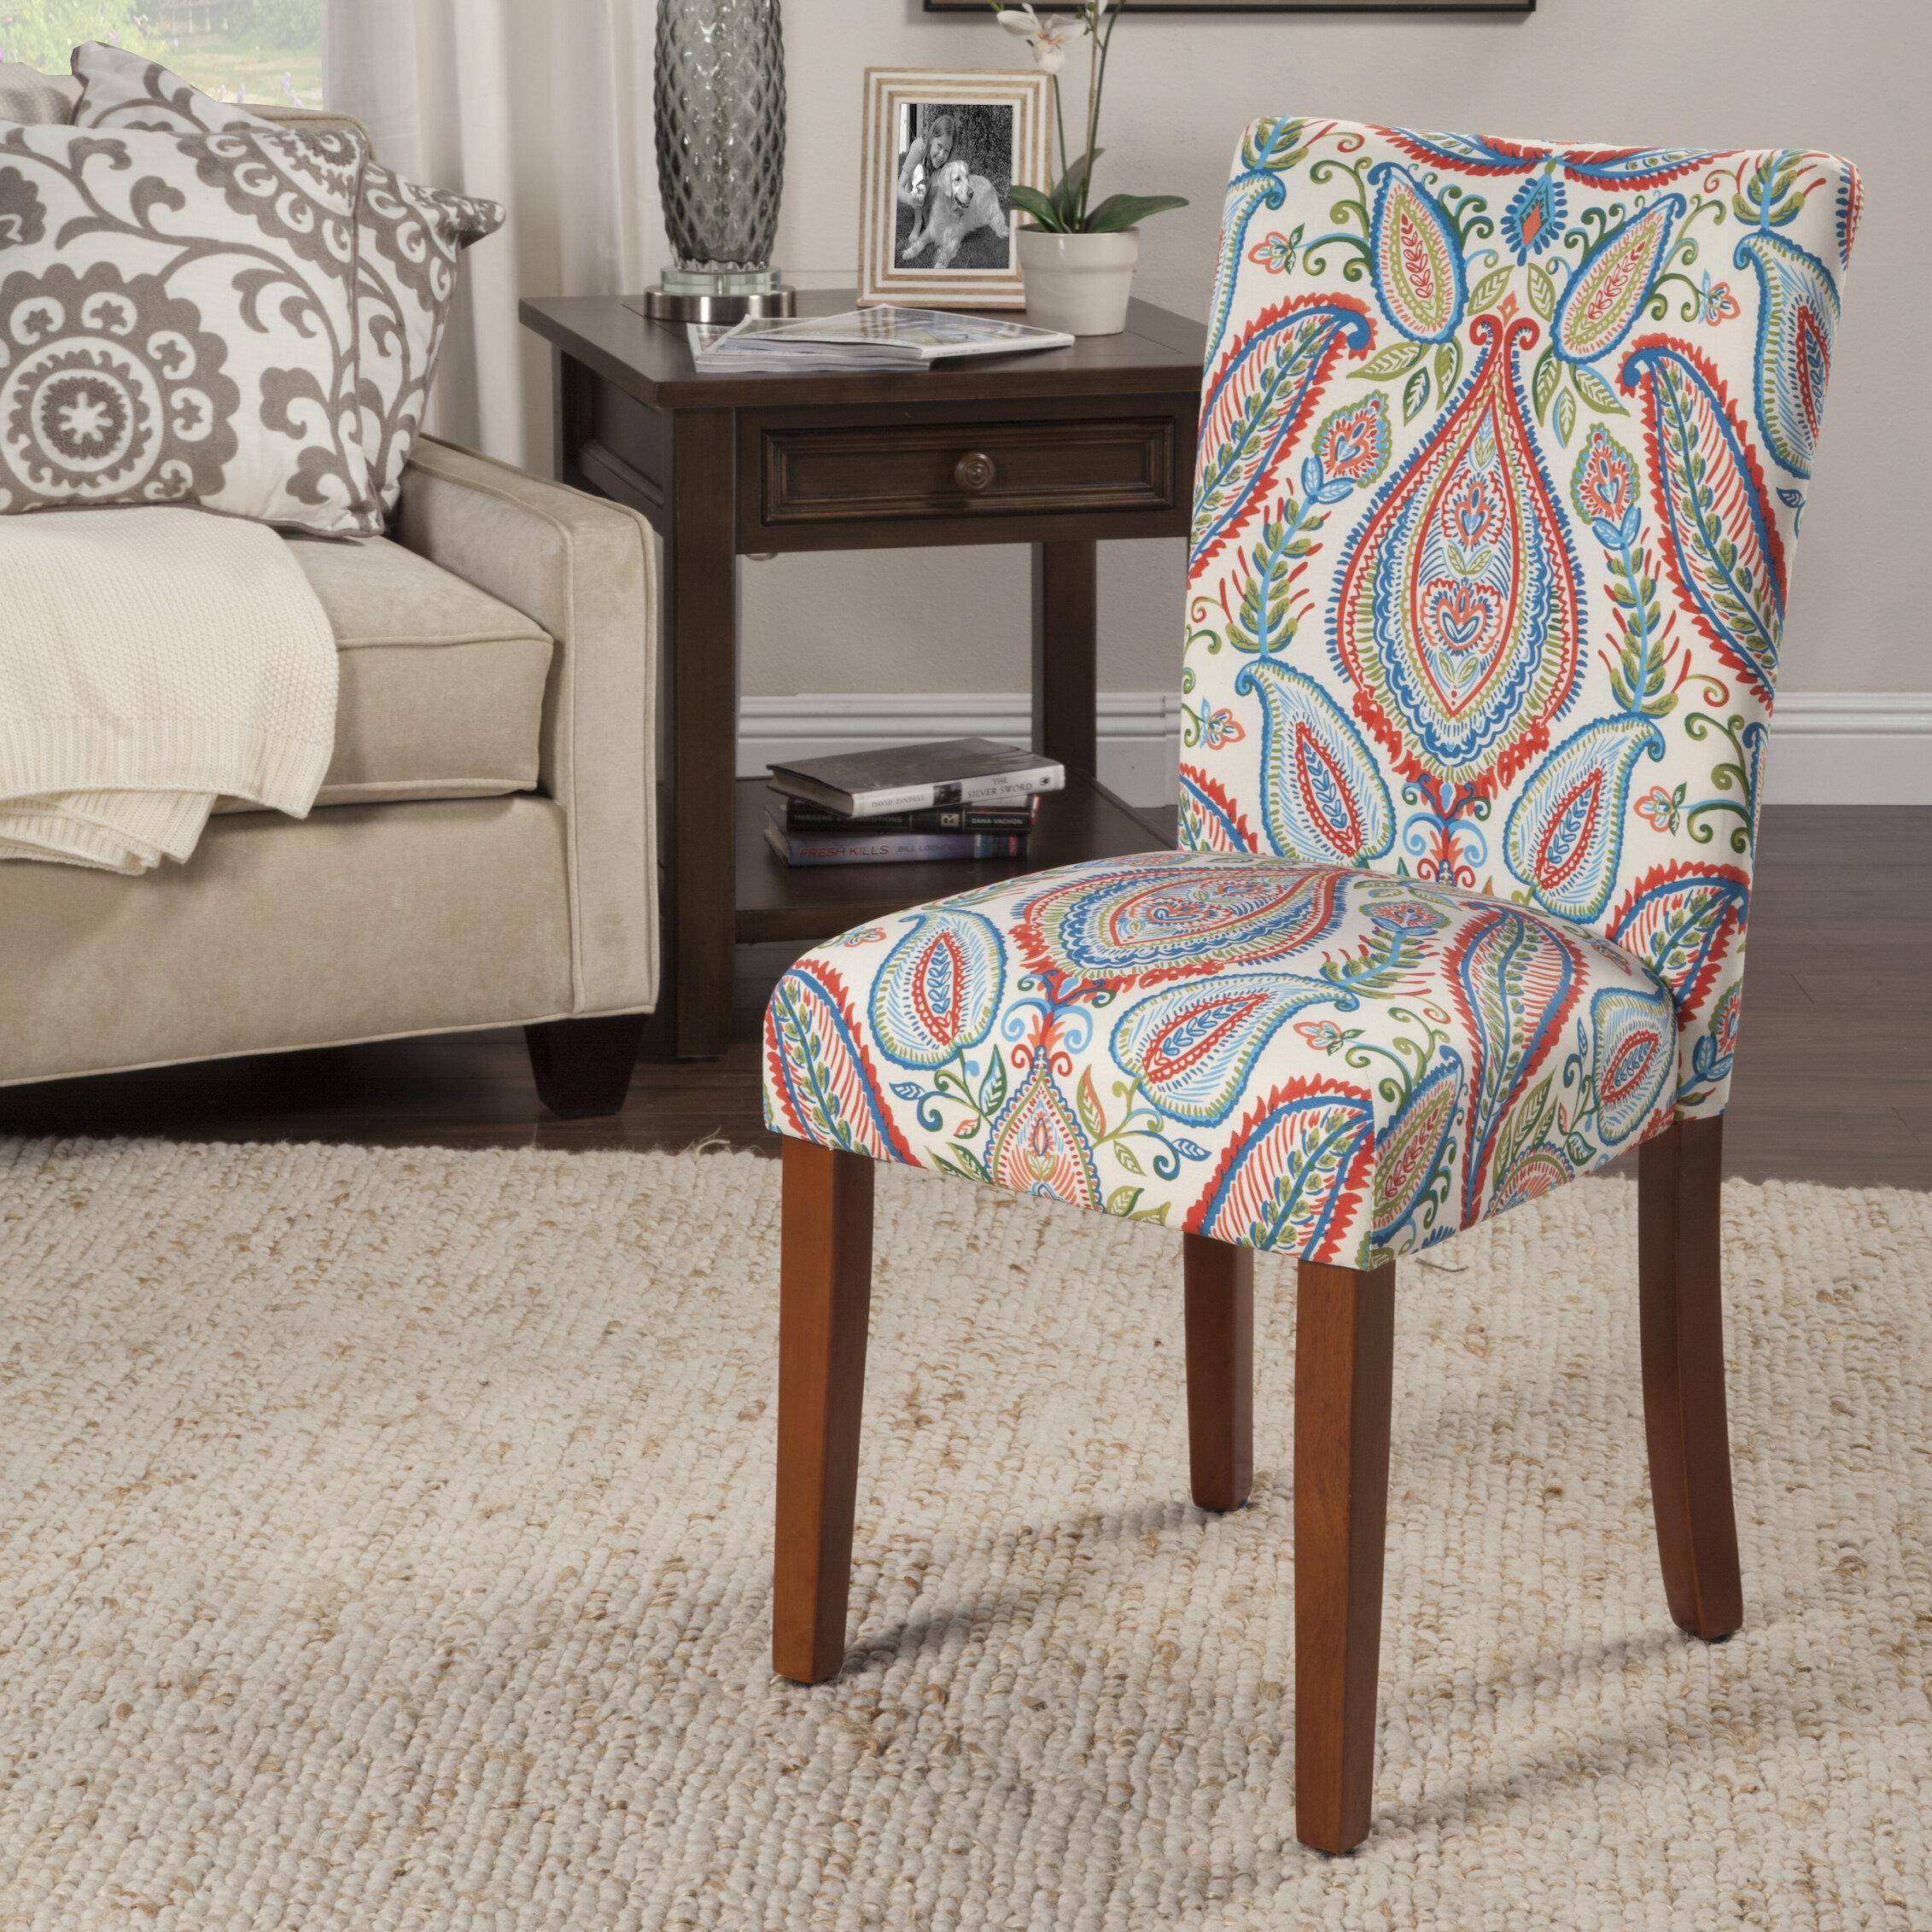 paisley furniture. Paisley Furniture E